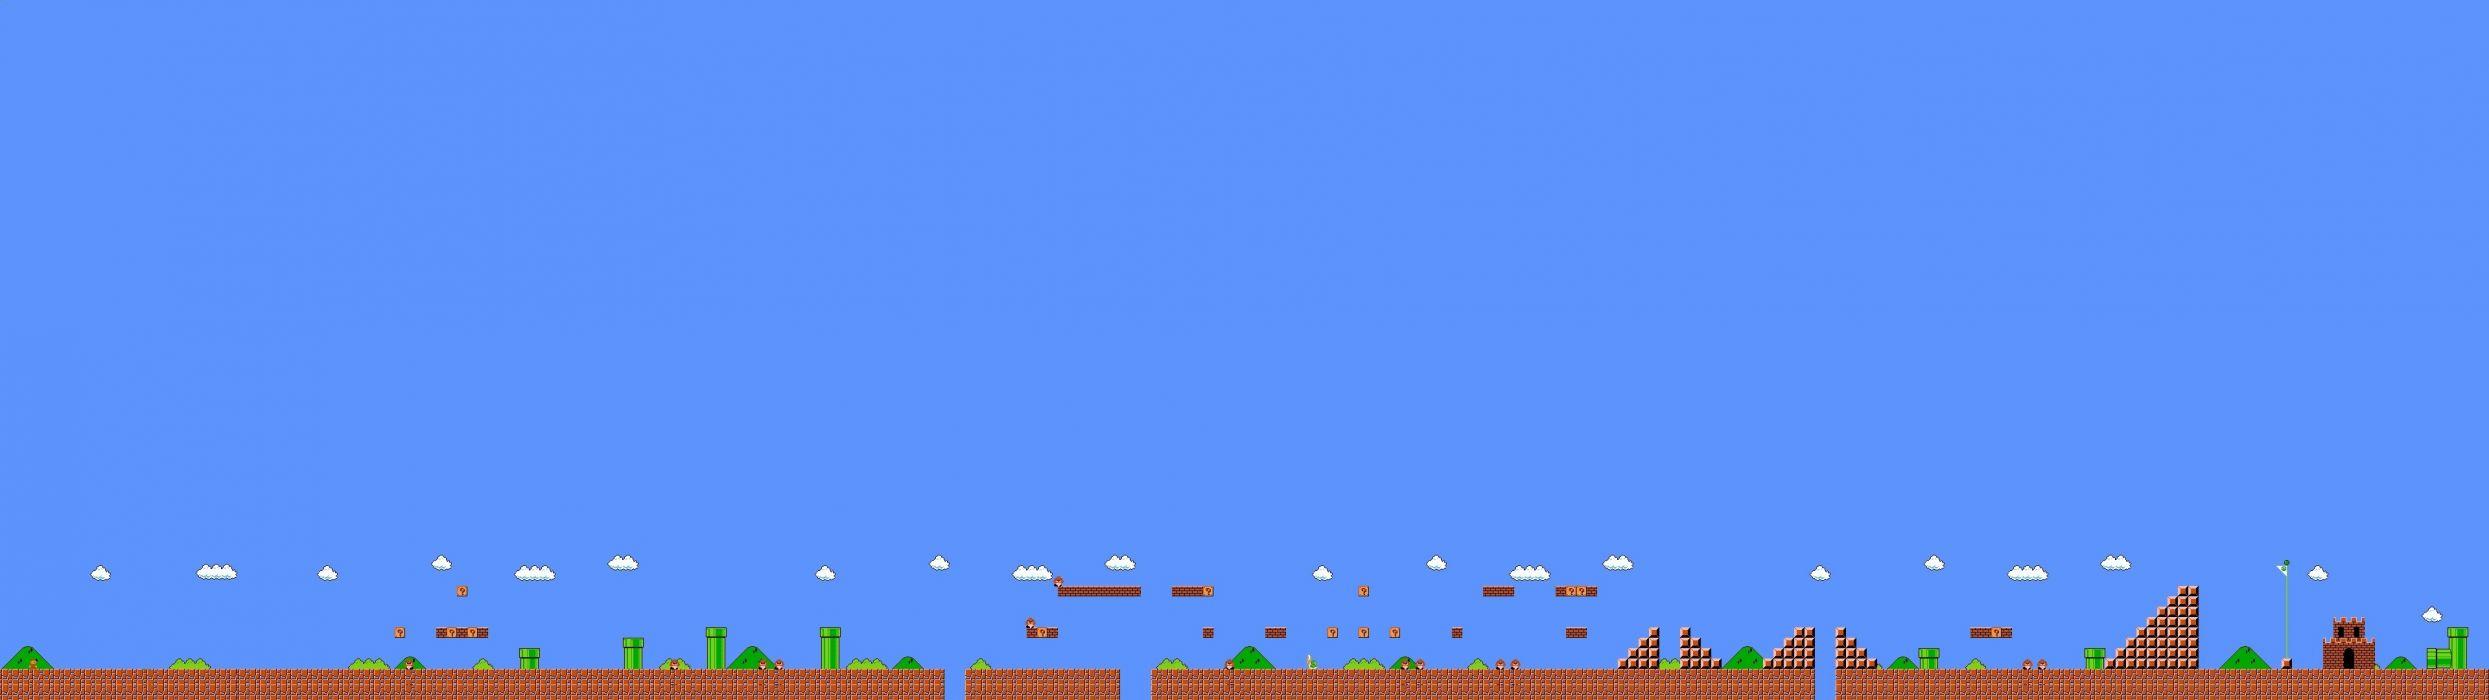 dual monitor screen multi multiple videogame game jeu video mario bross wallpaper